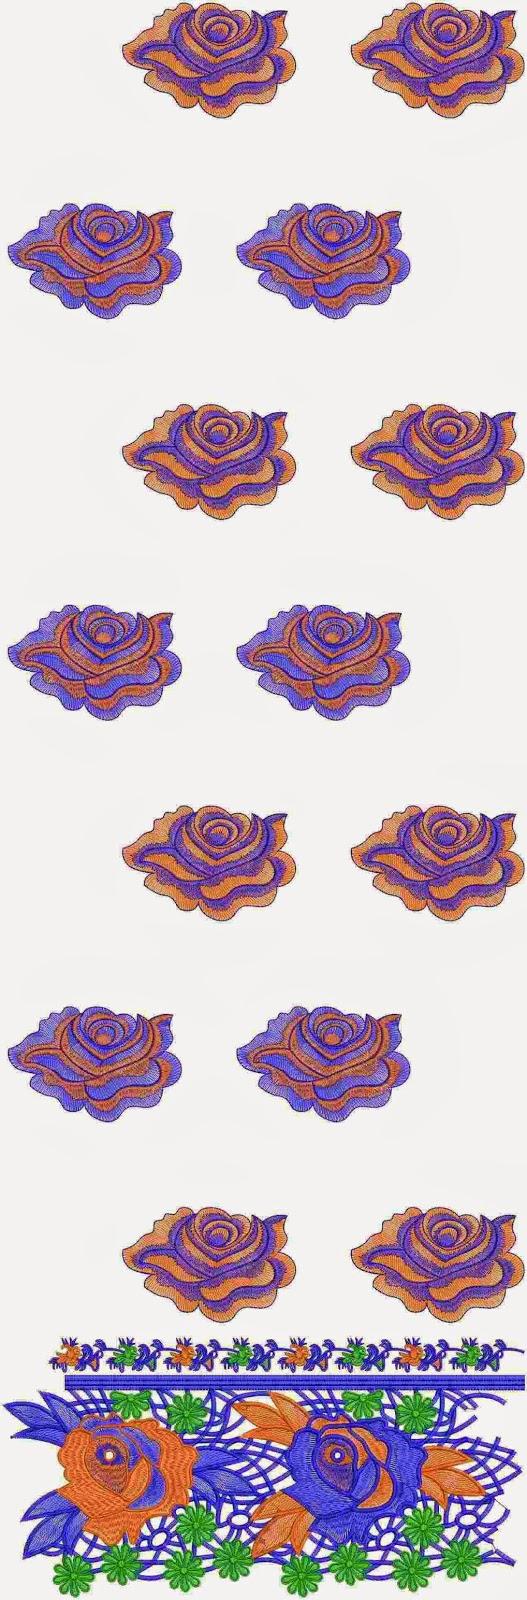 digitalisering borduurwerk Kurti